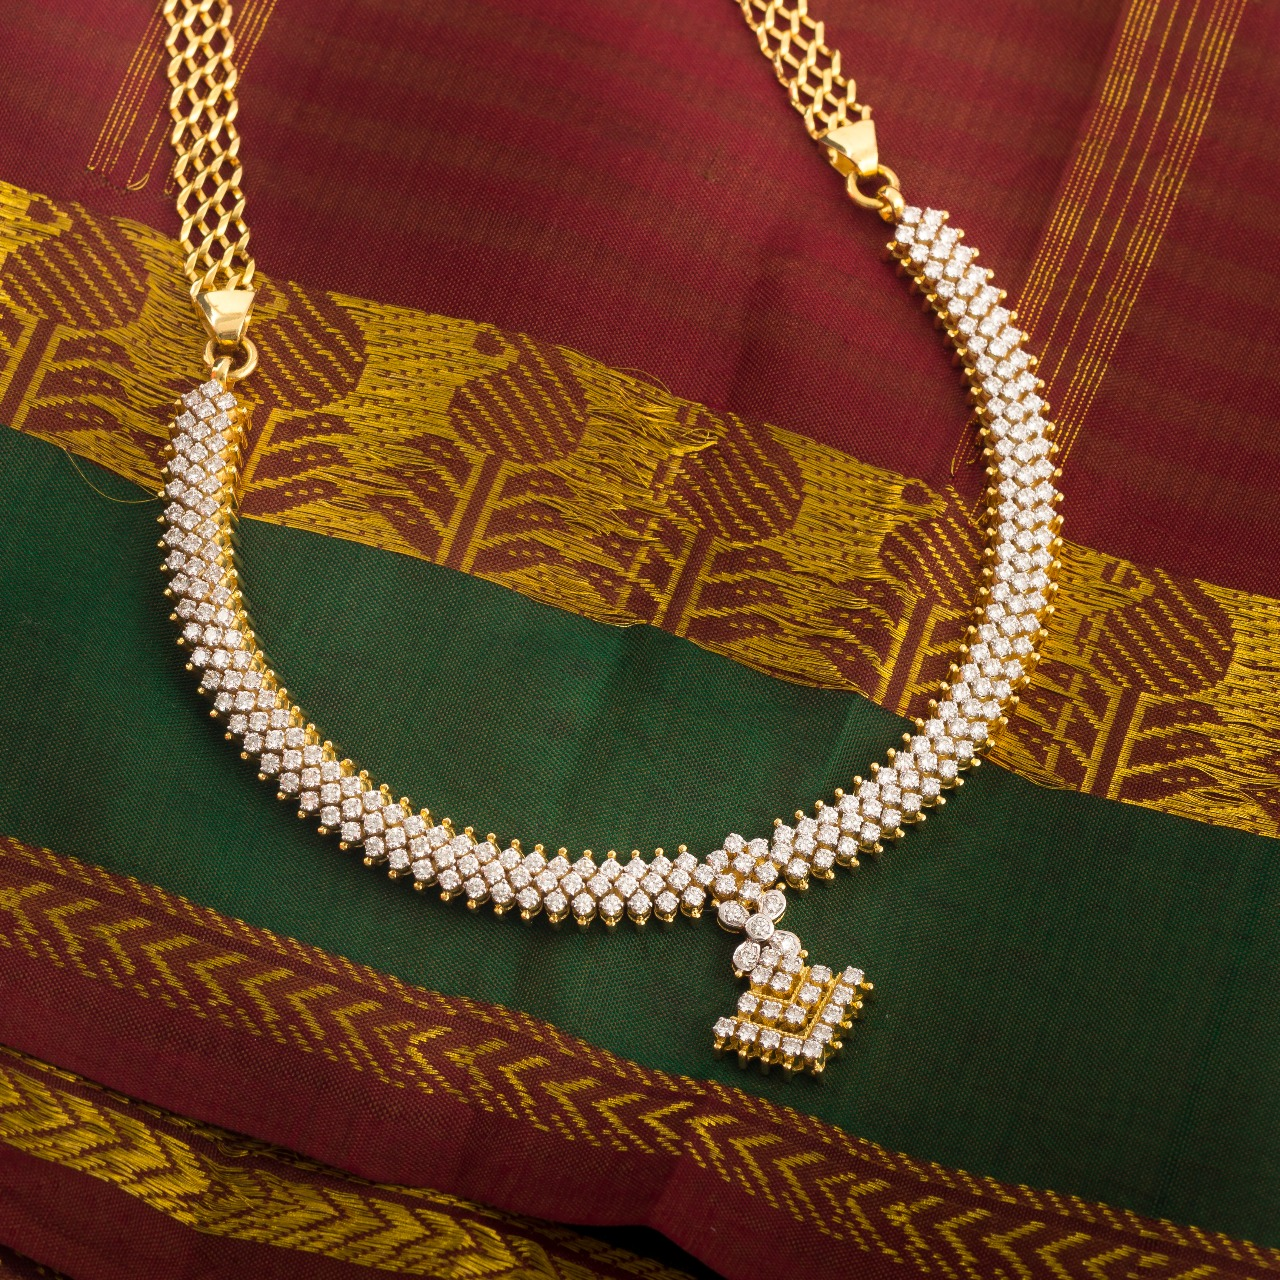 Ultra Gorgeous Diamond Necklace Designs13